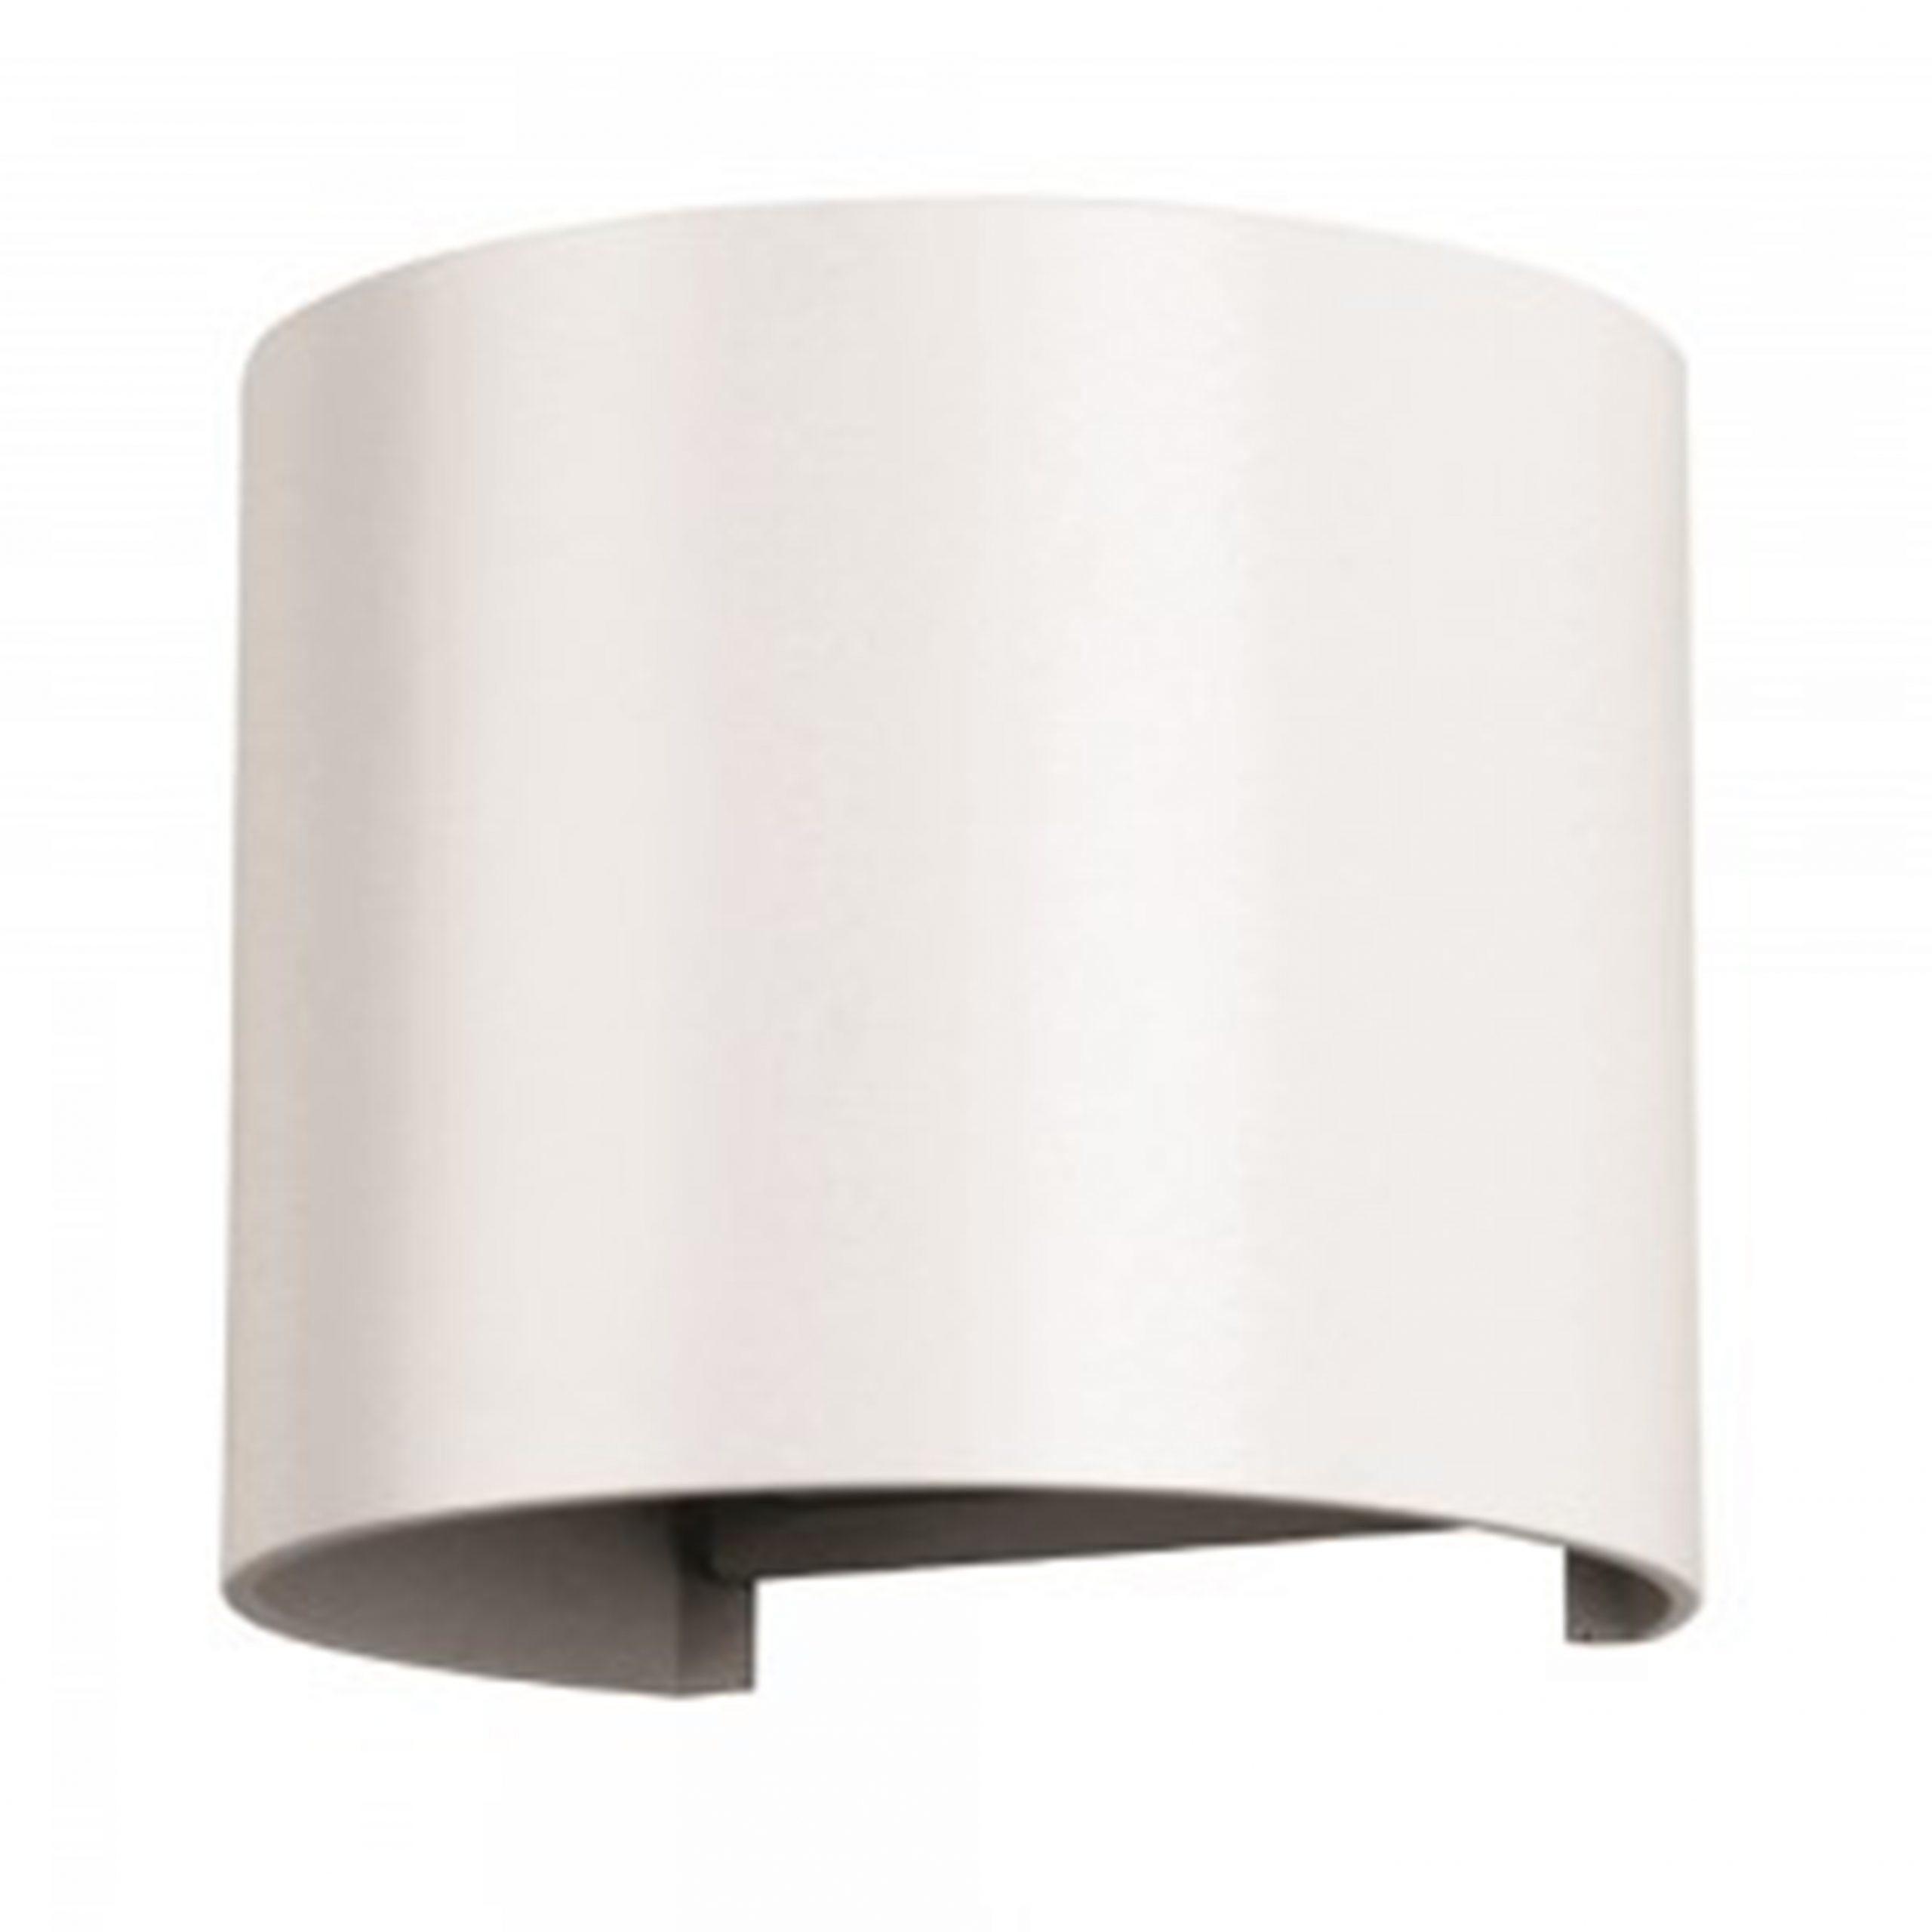 VT-759 Lampada LED da Muro Arrotondata Doppio LED COB 6W Bianco